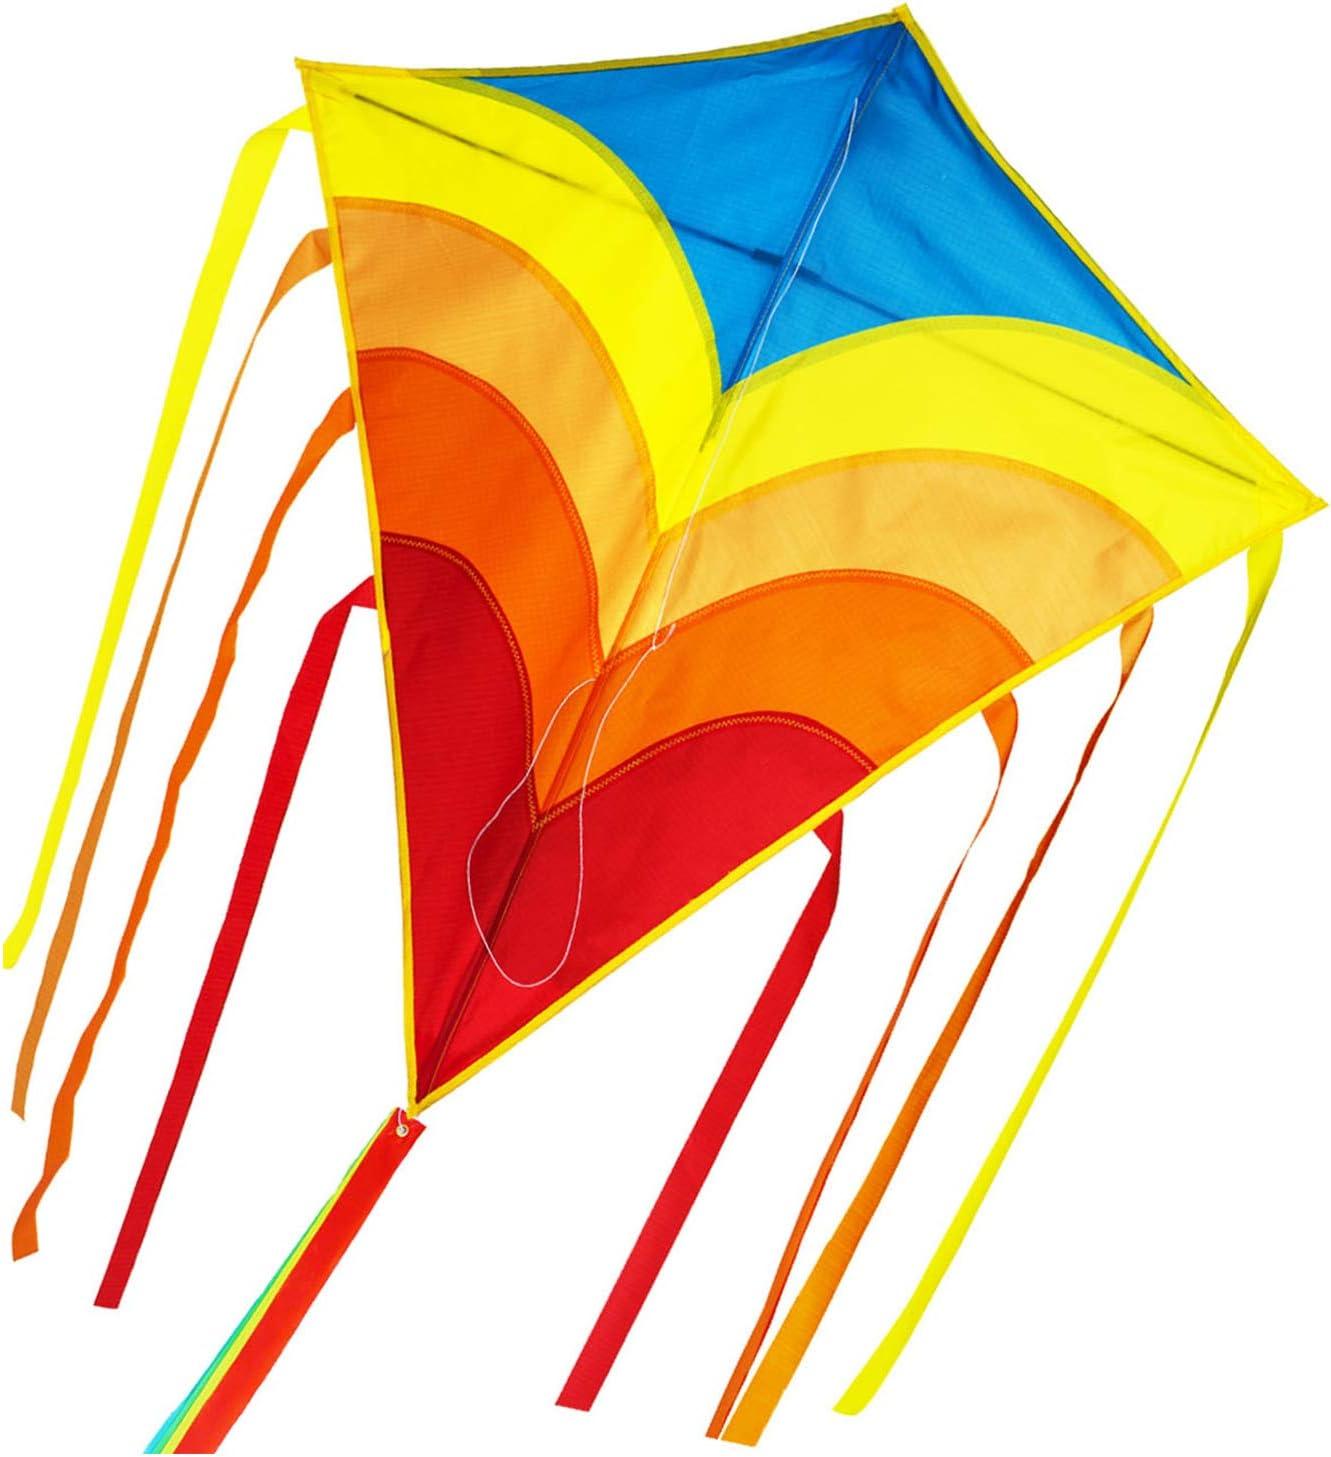 ZHUOYUE Rainbow Diamond Kite for Kids Ki Line and Super Popular popular special price Adults Single